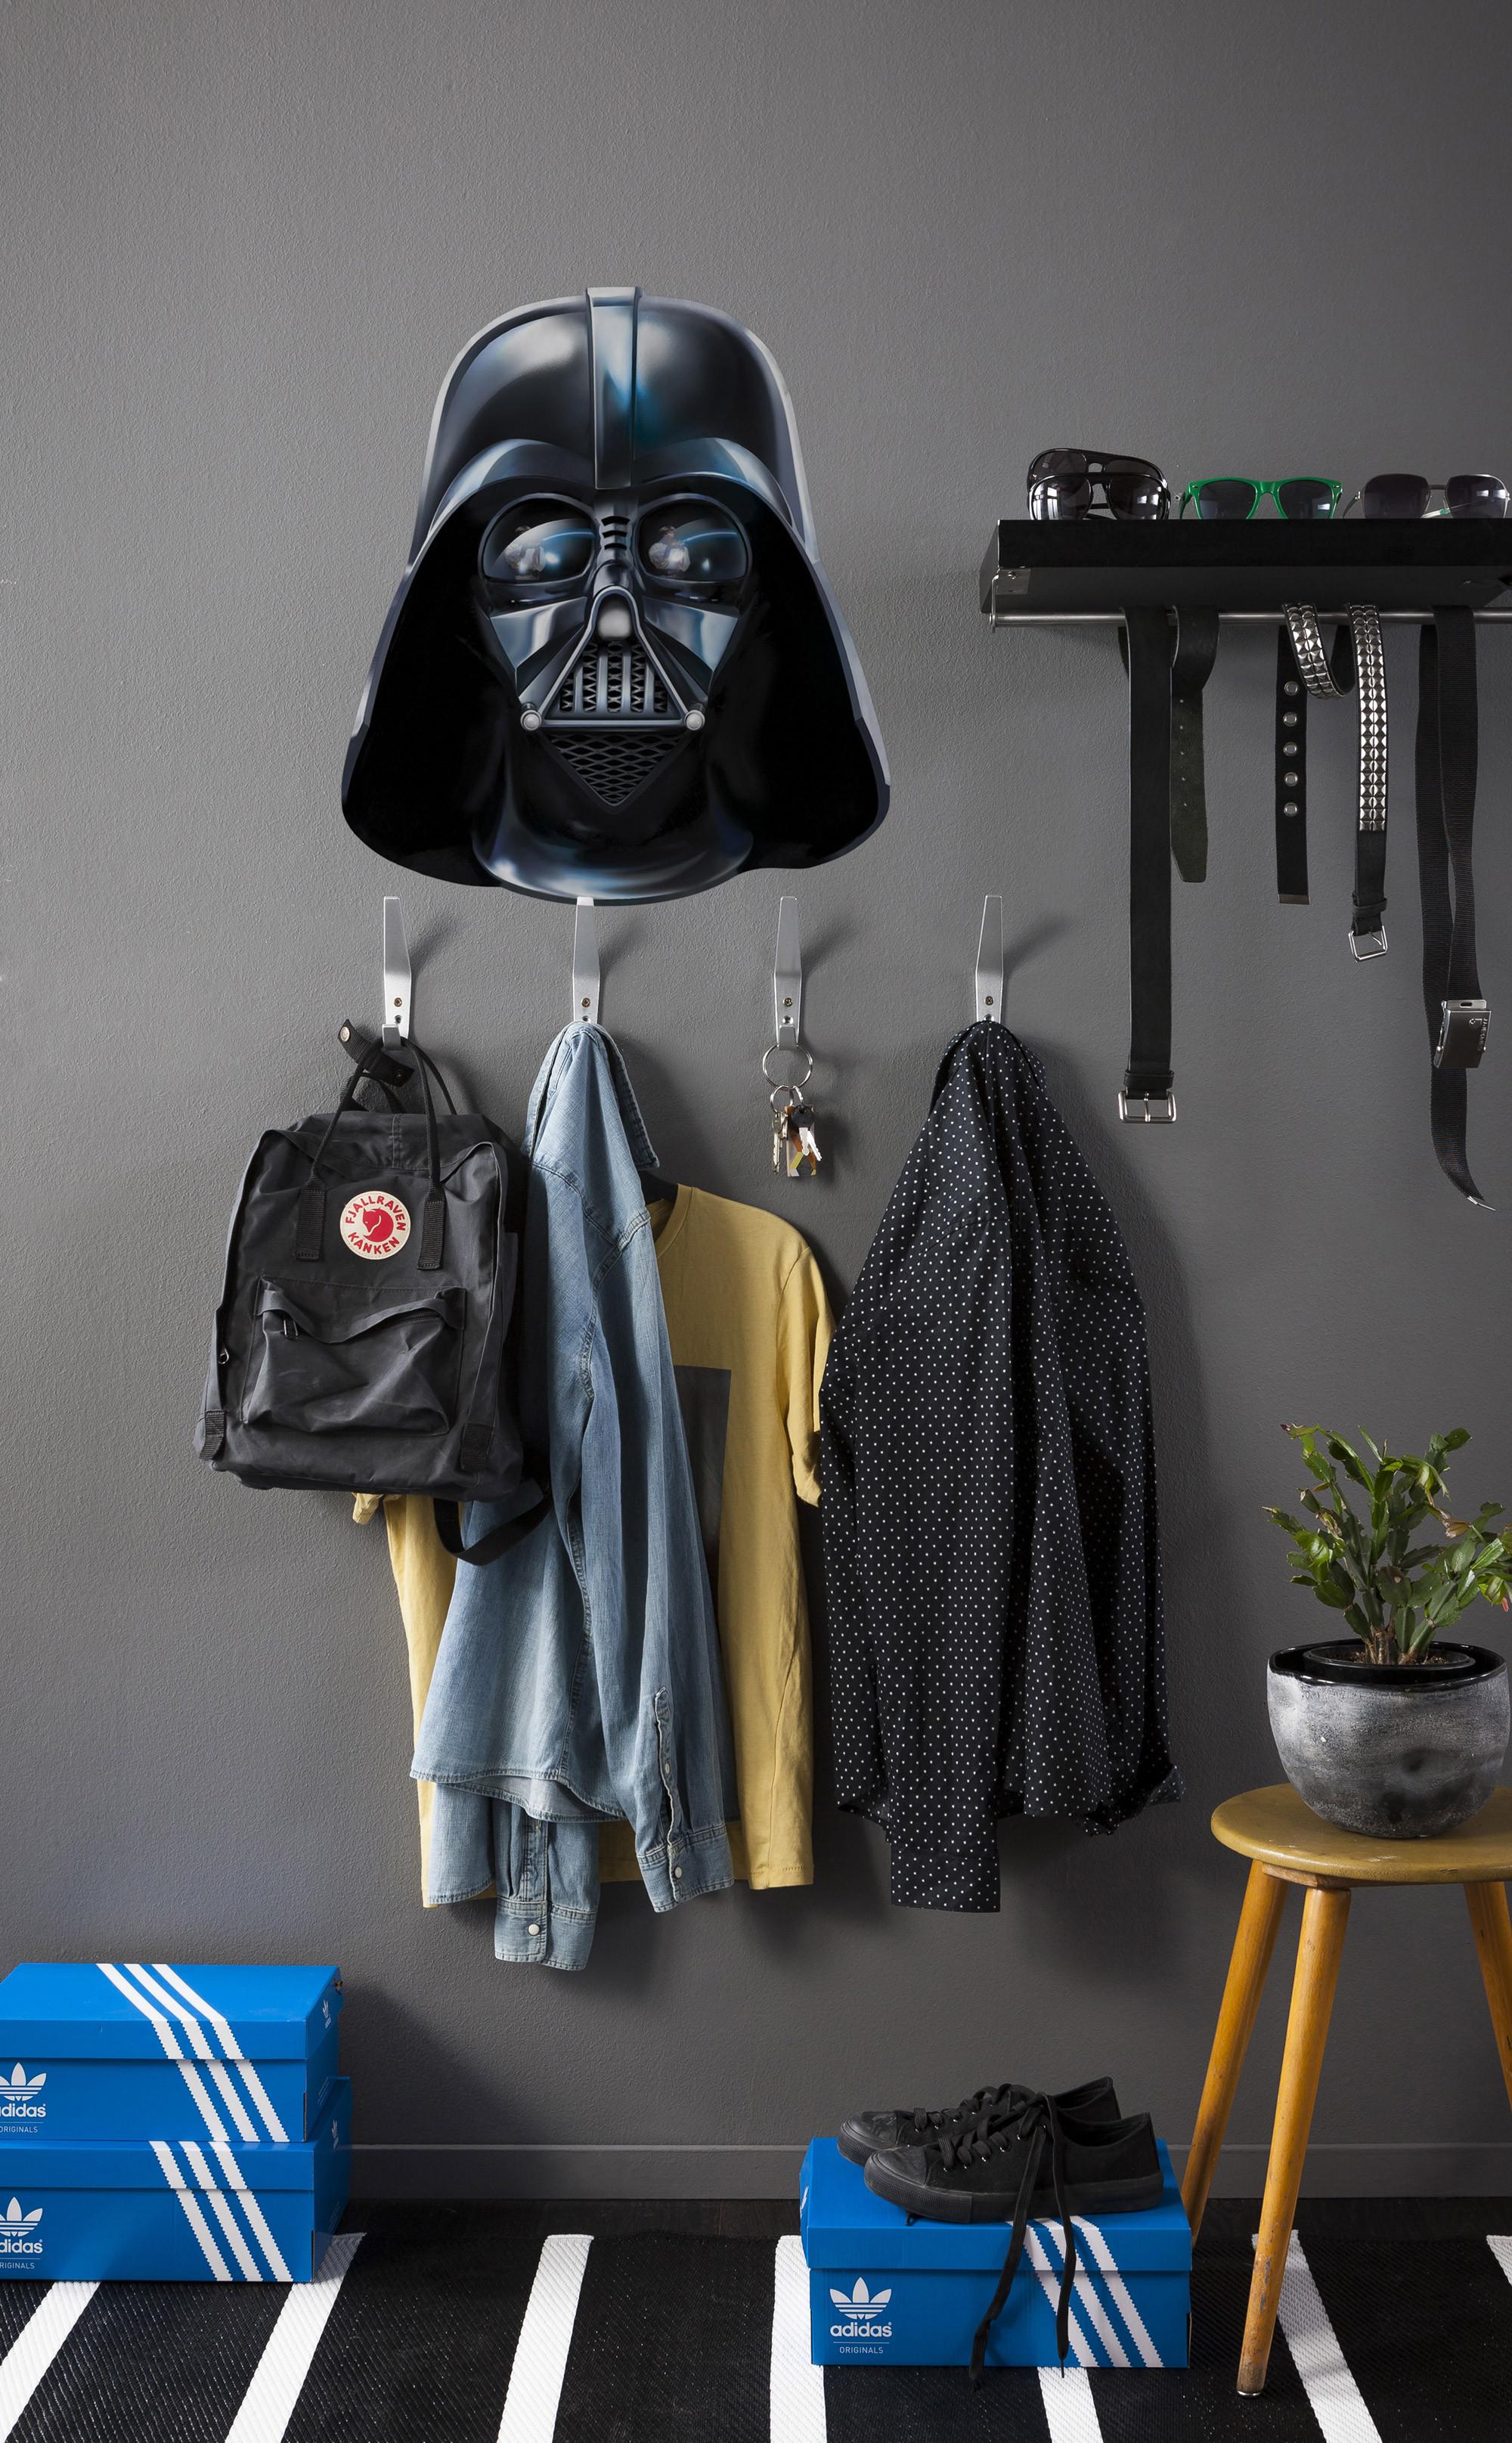 wandsticker star wars darth vader von komar. Black Bedroom Furniture Sets. Home Design Ideas